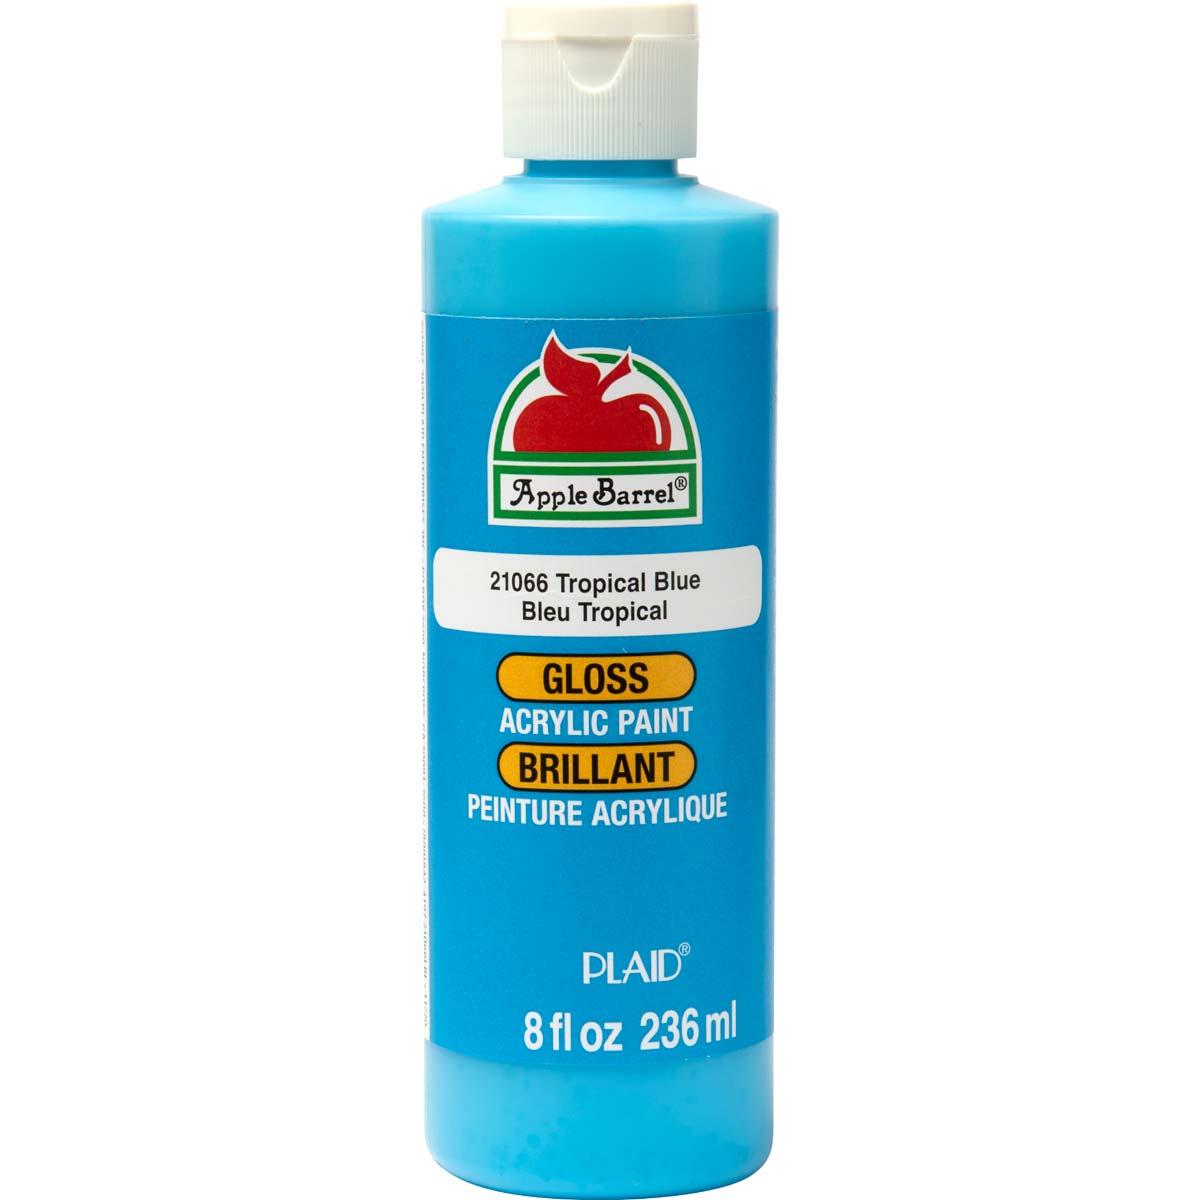 Apple Barrel ® Gloss™ - Tropical Blue, 8 oz. - 21066